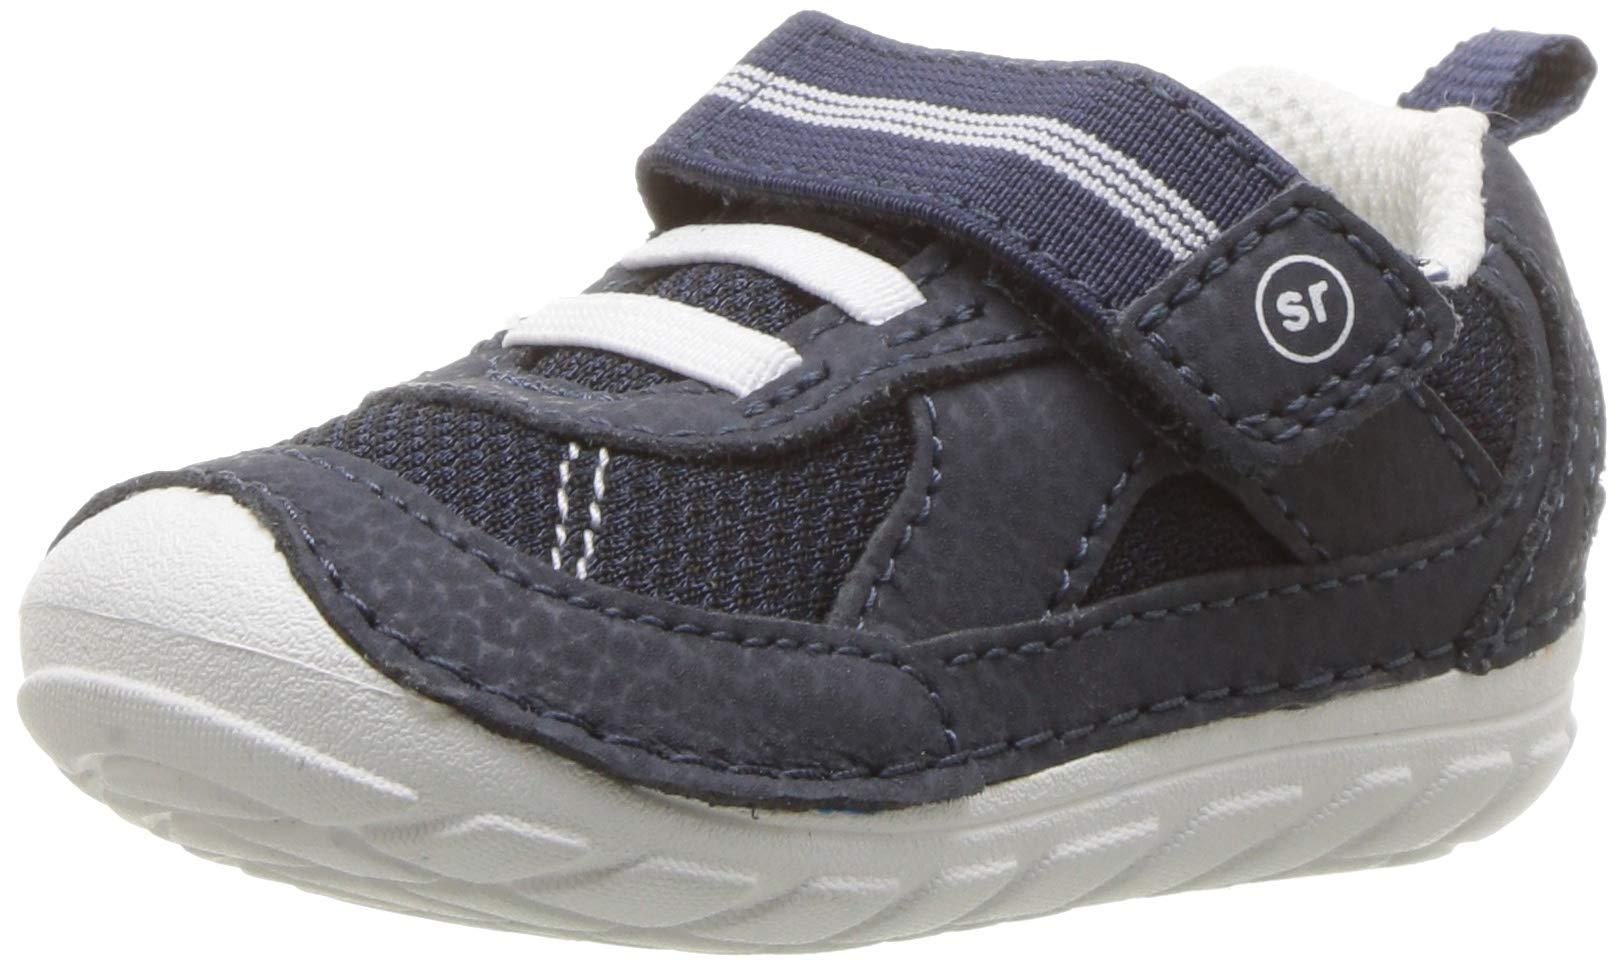 Stride Rite Boys' Soft Motion Jamie Sneaker, Navy/White, 5 W US Toddler